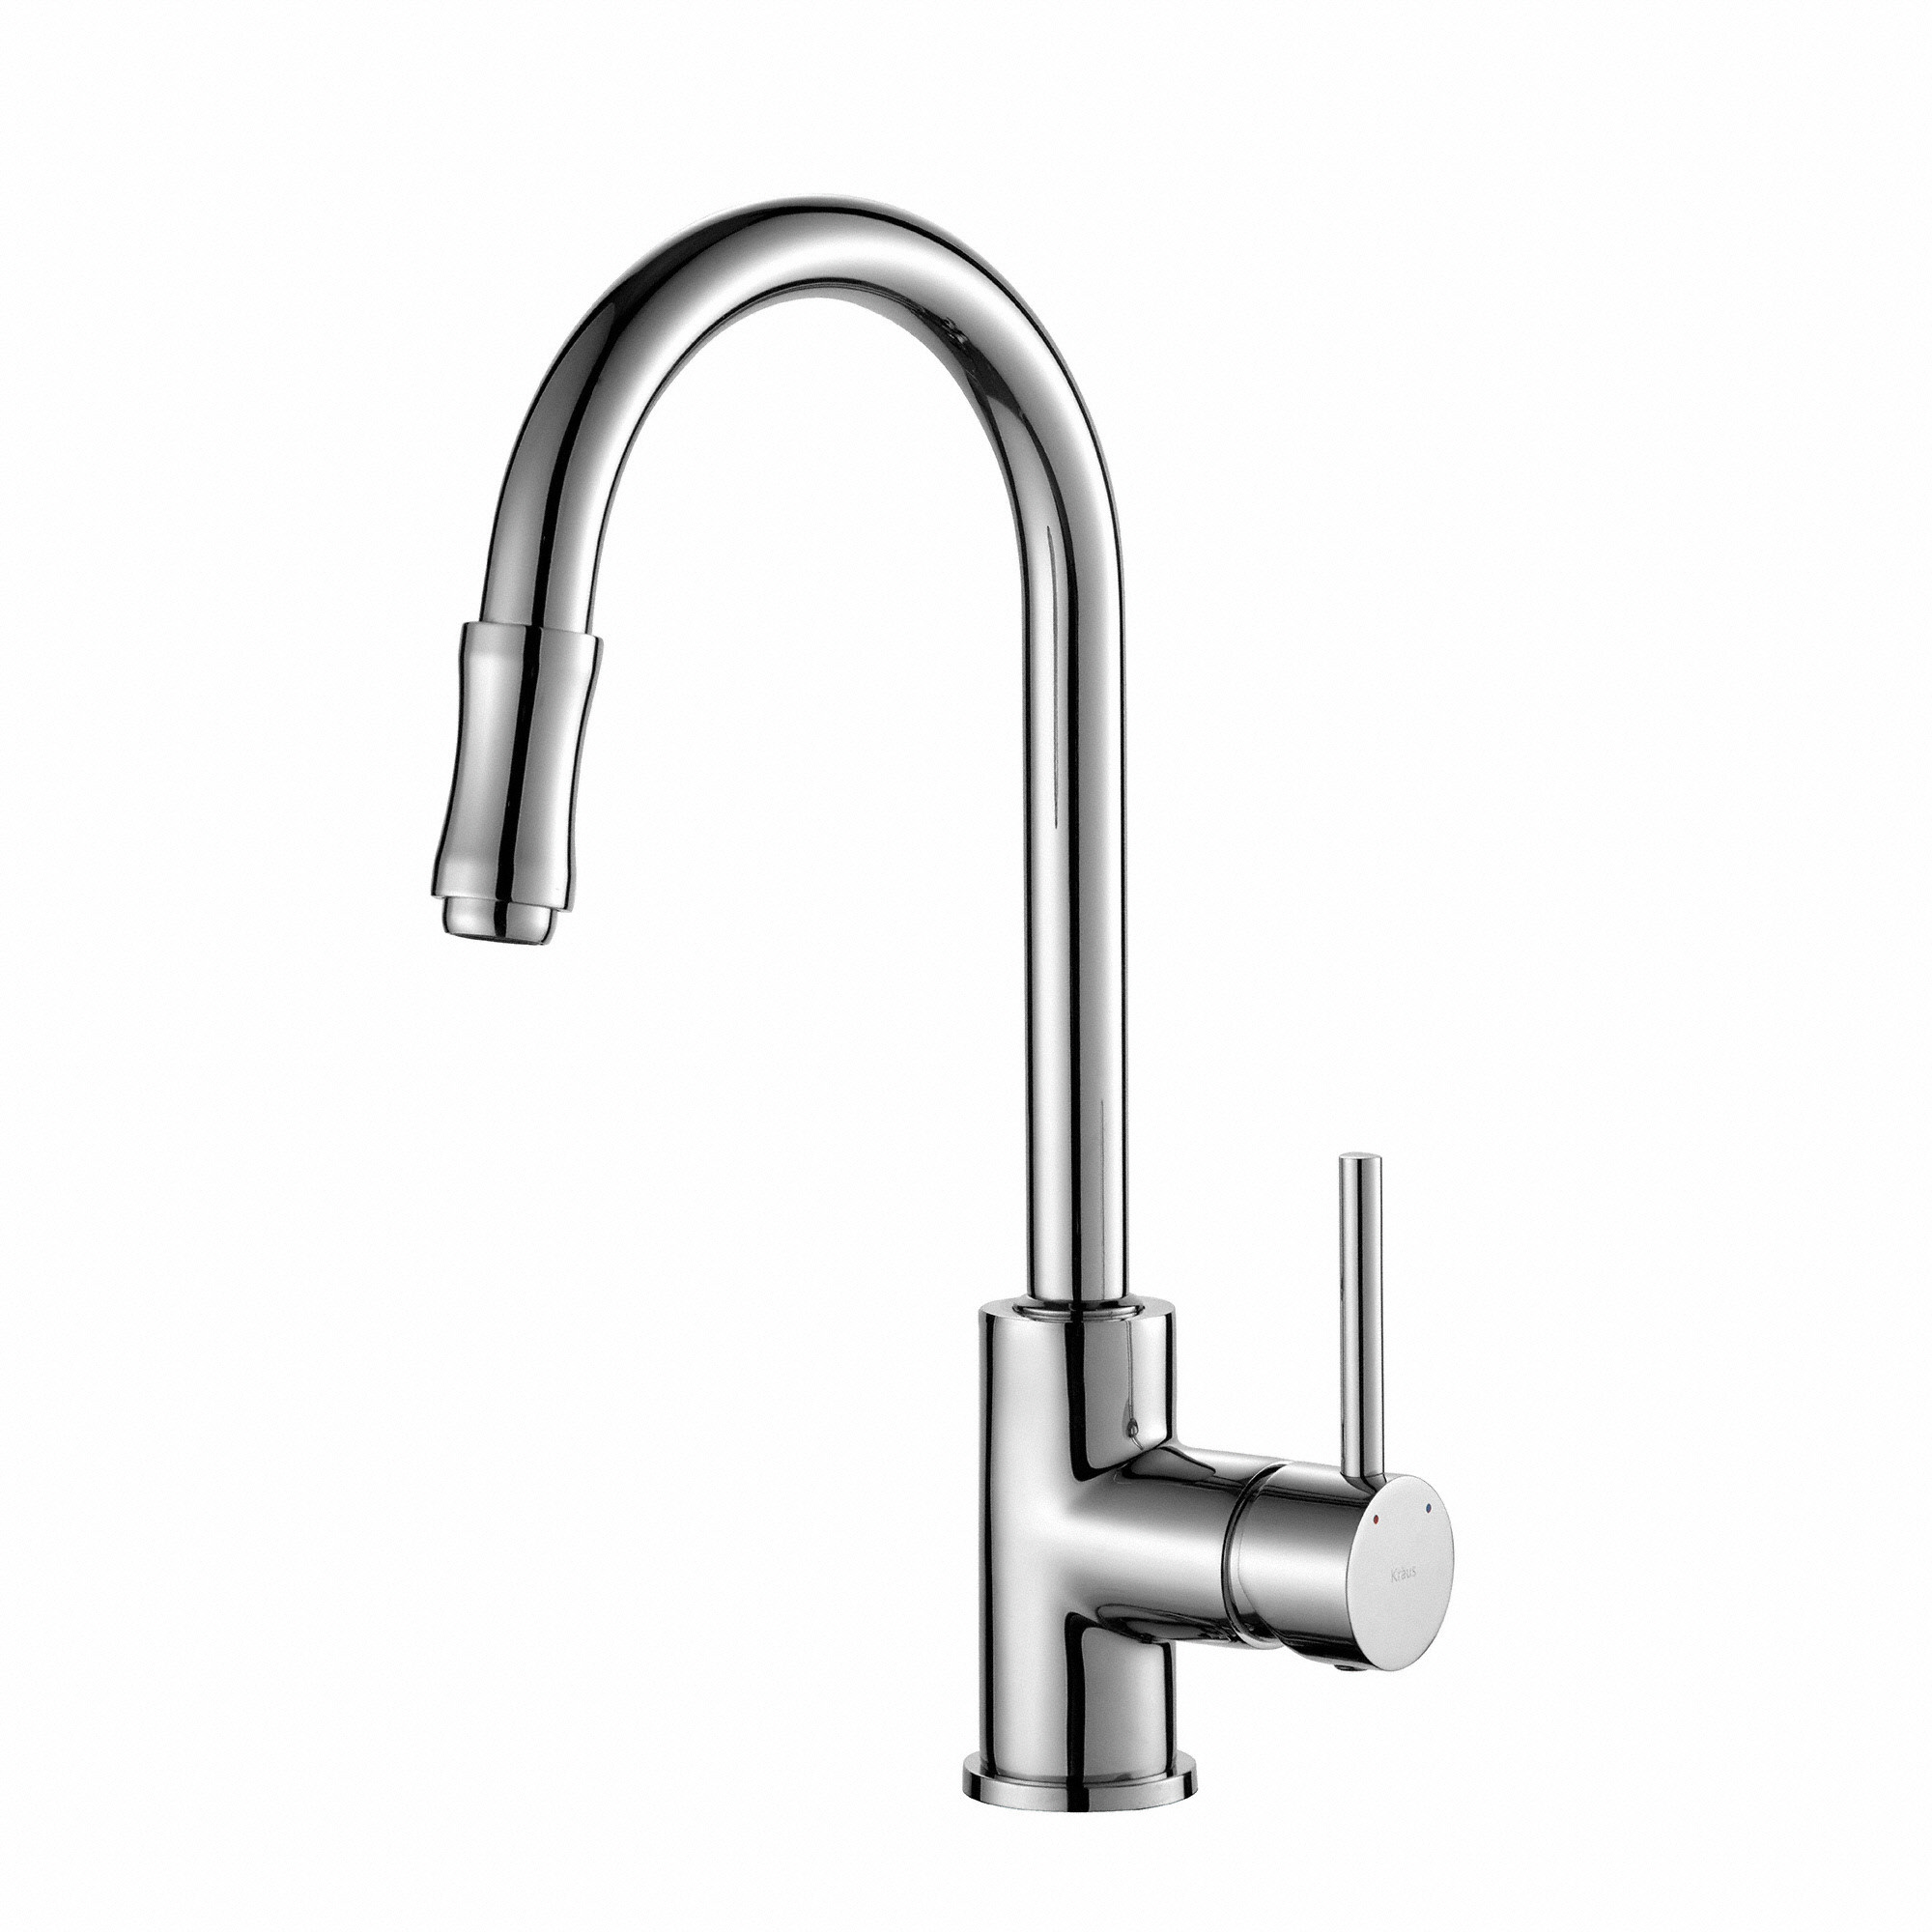 Kraus Kitchen Faucet Series KPF1622CH